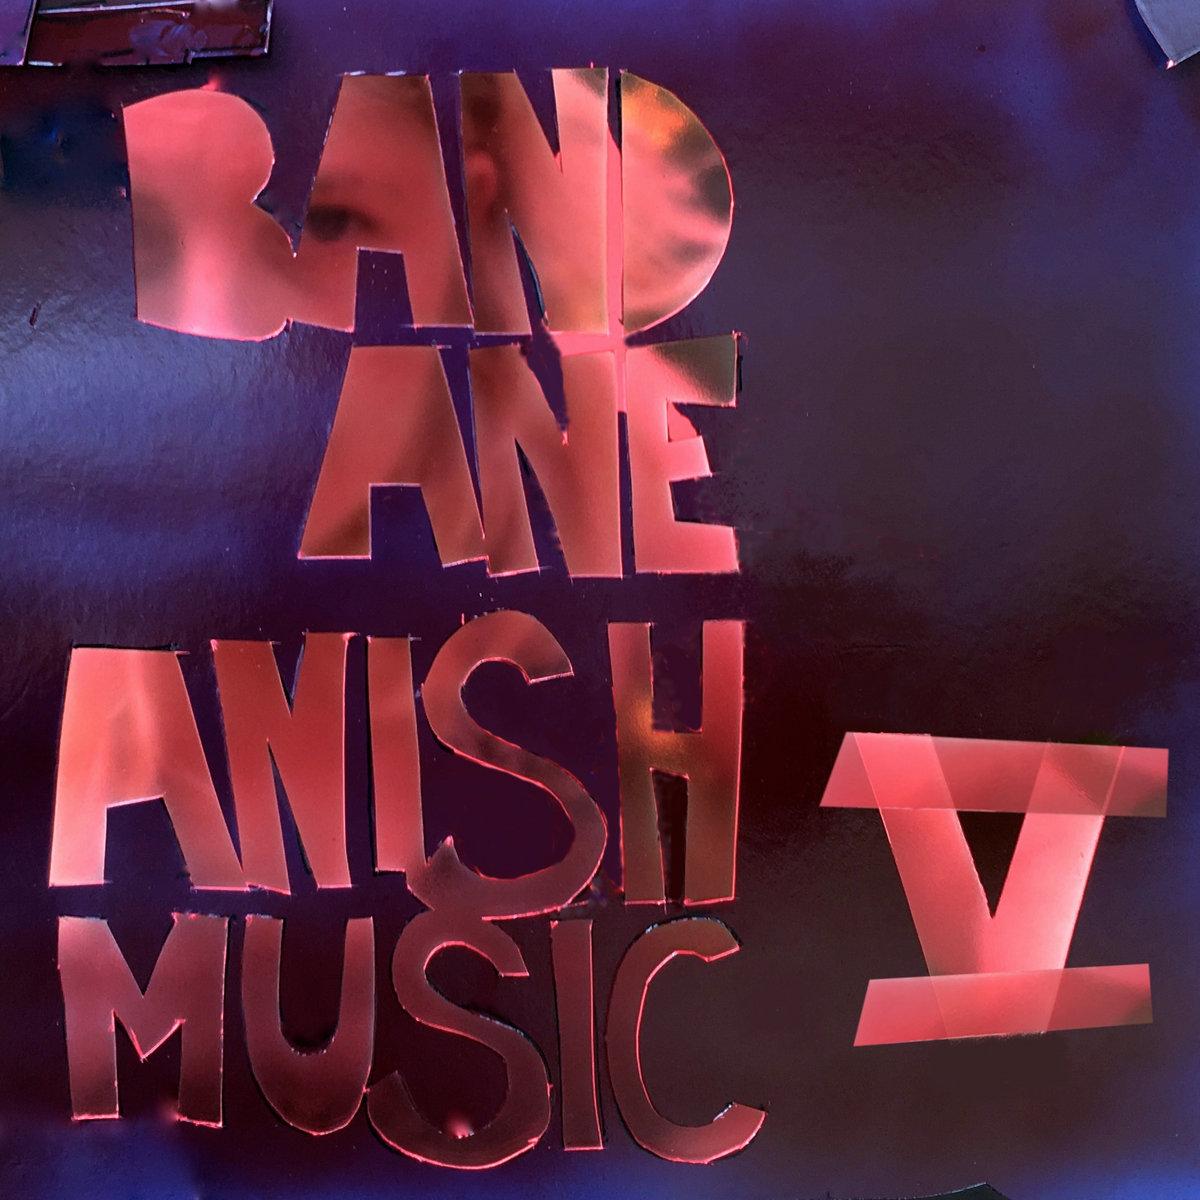 Anish Music V